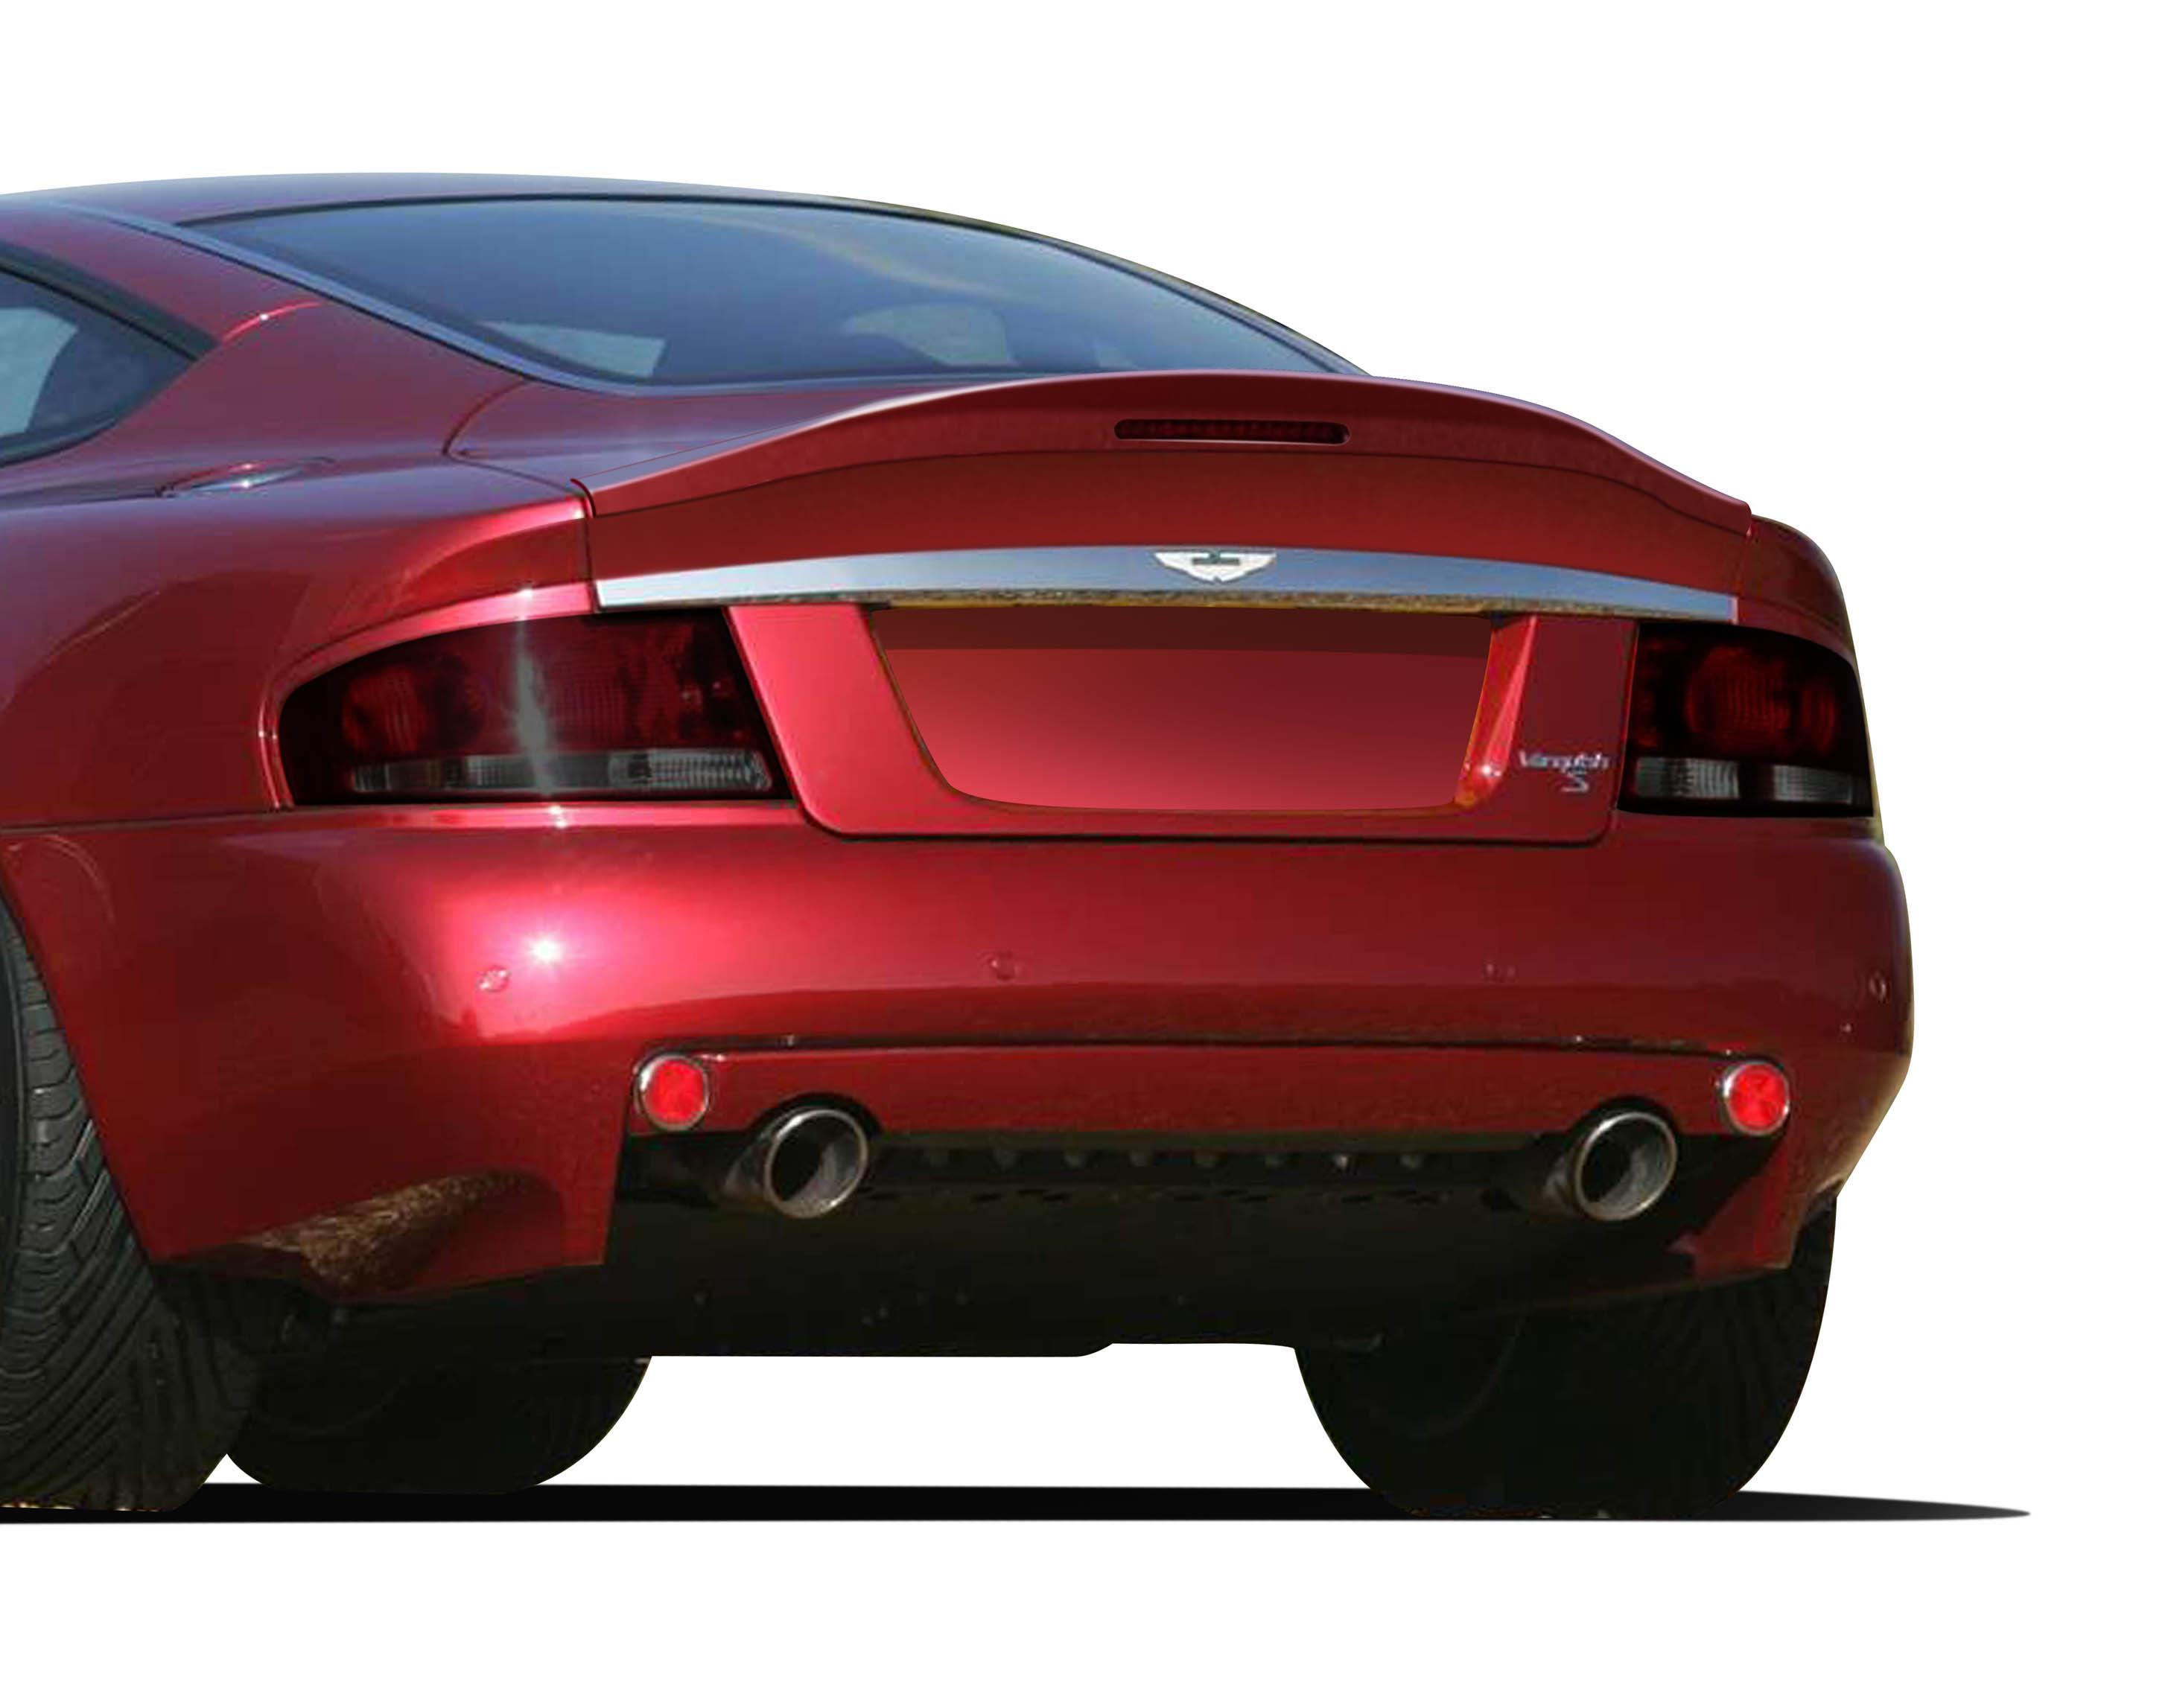 Fiberglass+ Trunk/Hatch Bodykit for 2006 Aston Martin Vanquish ALL - 2002-2006 Aston Martin Vanquish S AF-1 Trunk Spoiler ( GFK ) - 1 Piece